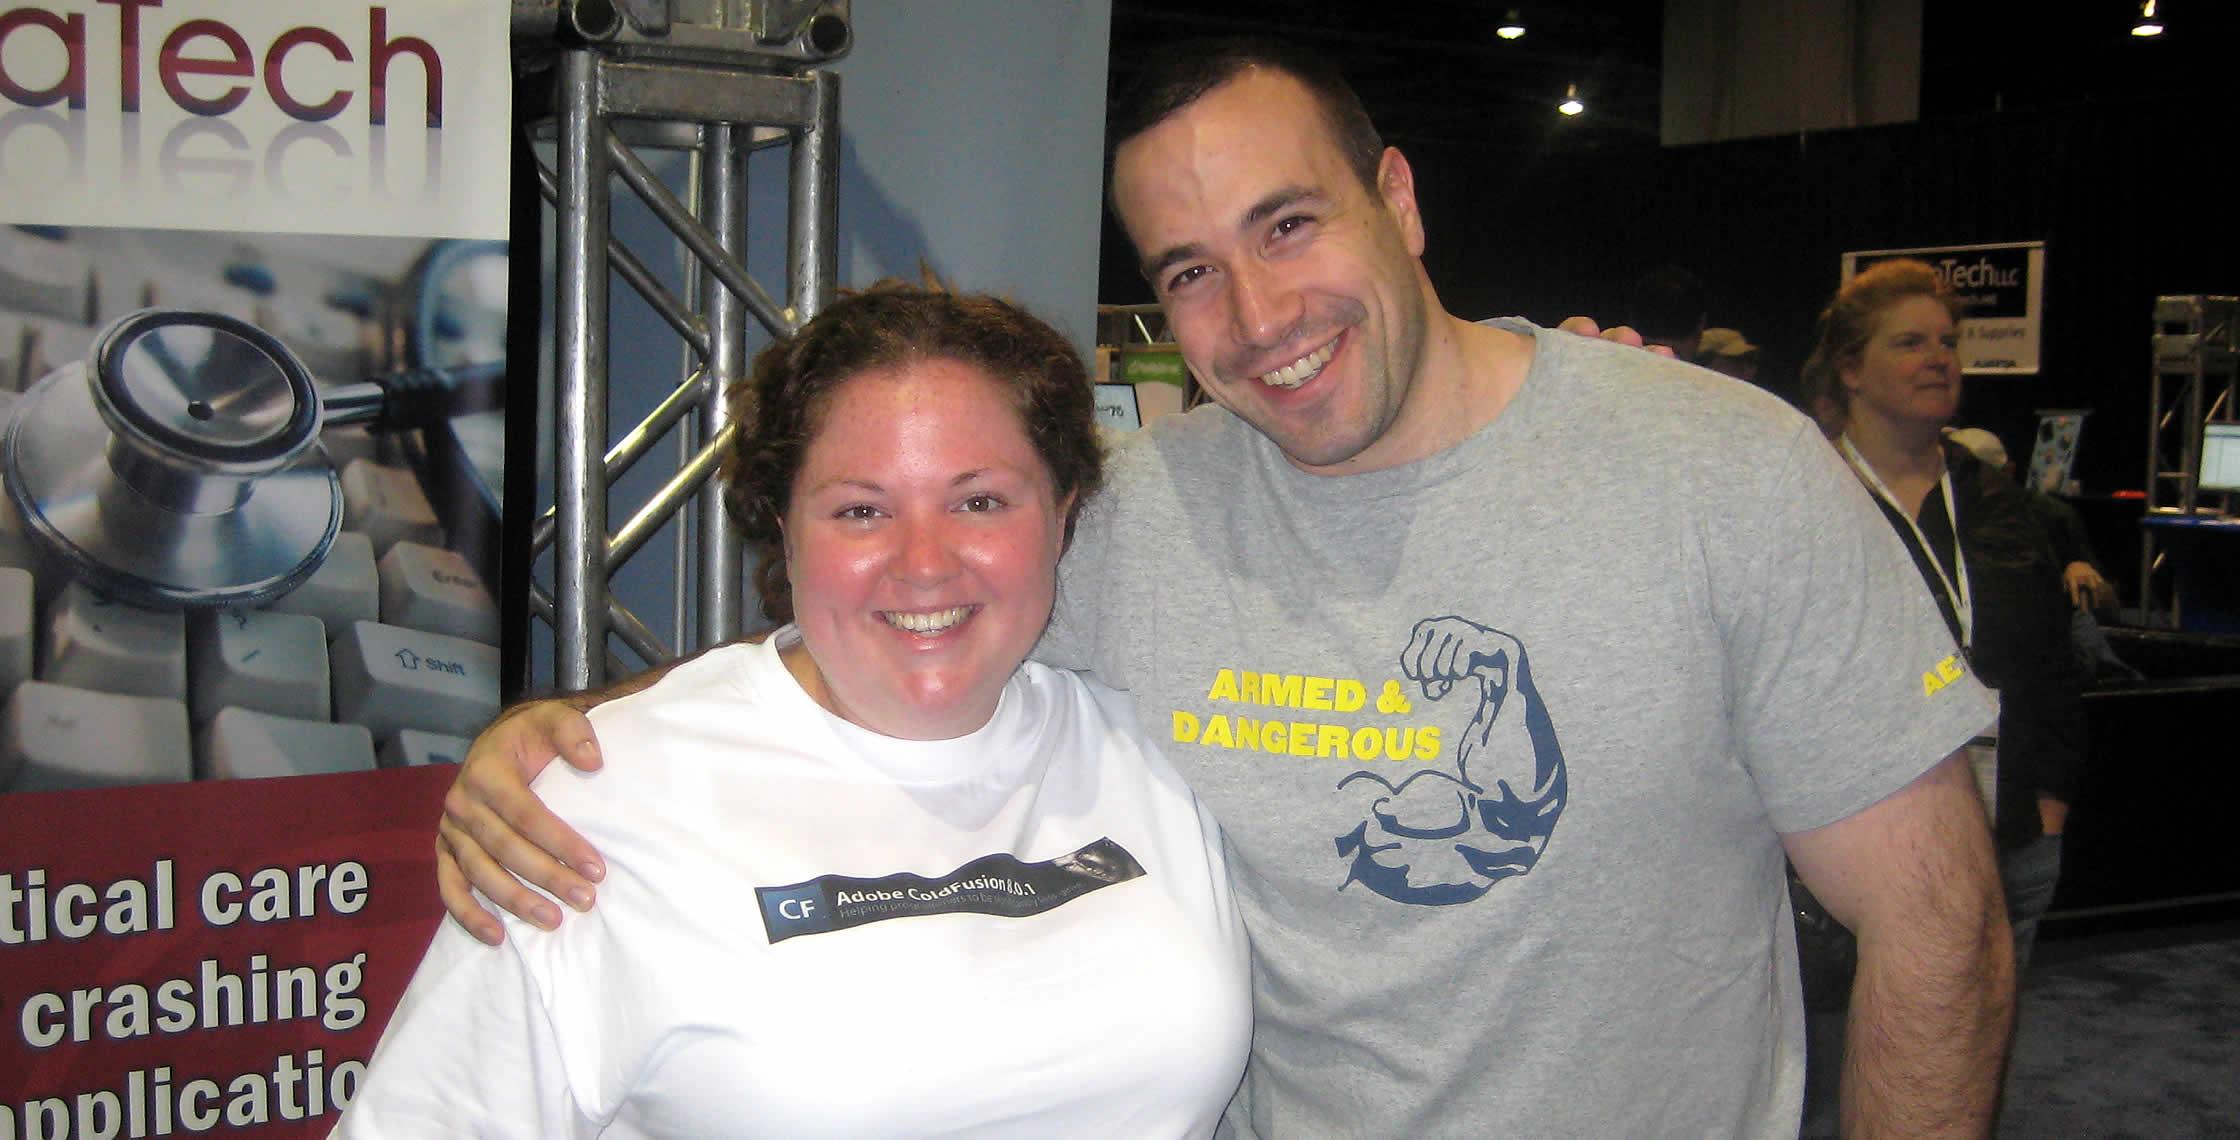 Ben Nadel at CFUNITED 2008 (Washington, D.C.) with: Katie Maher